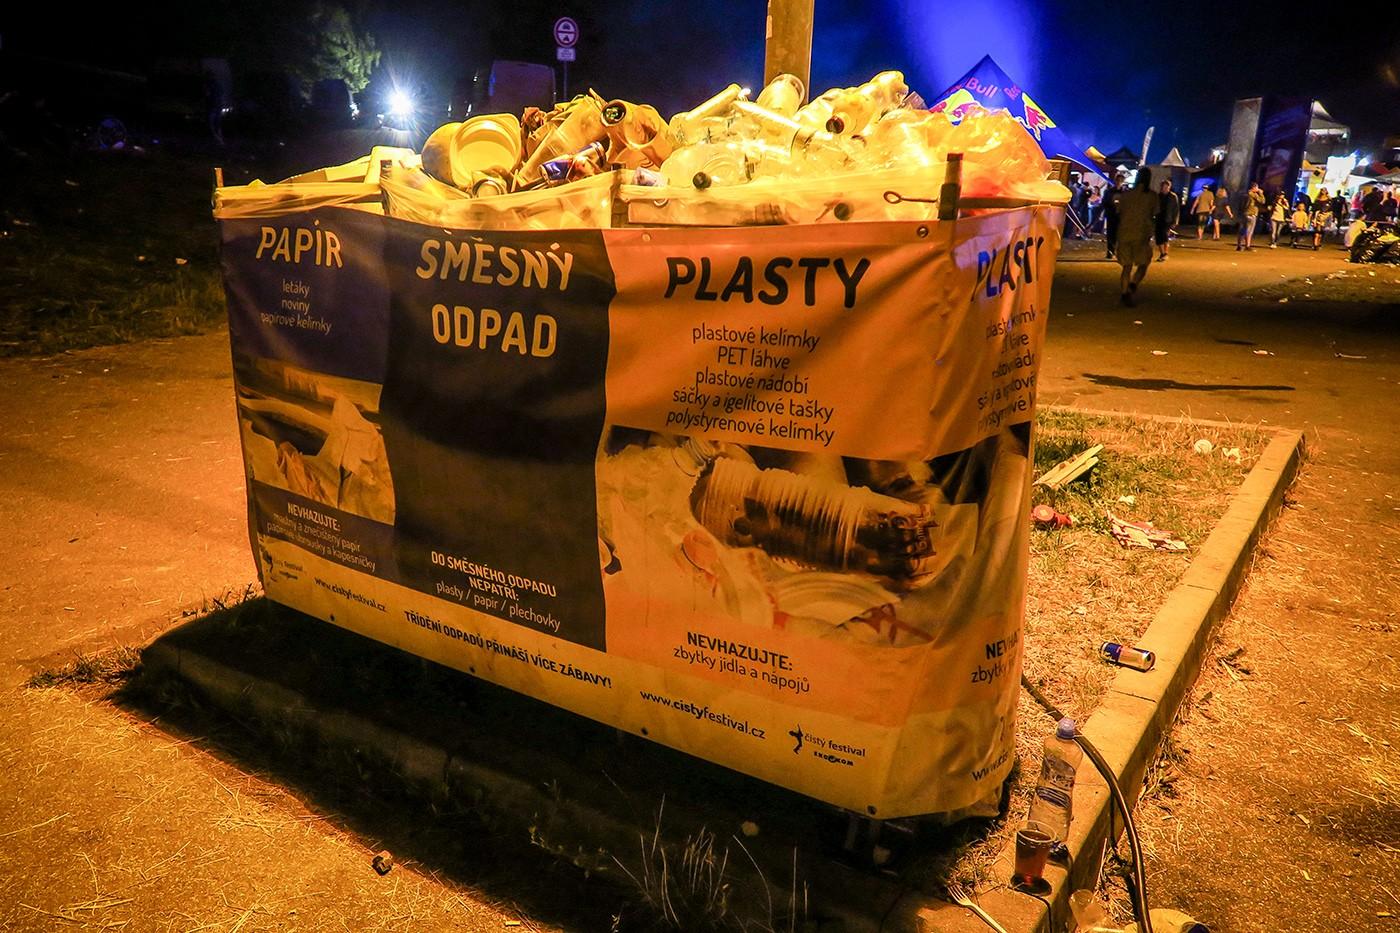 trideni_odpadu_papir_smesny_odpad_plast_festivaly